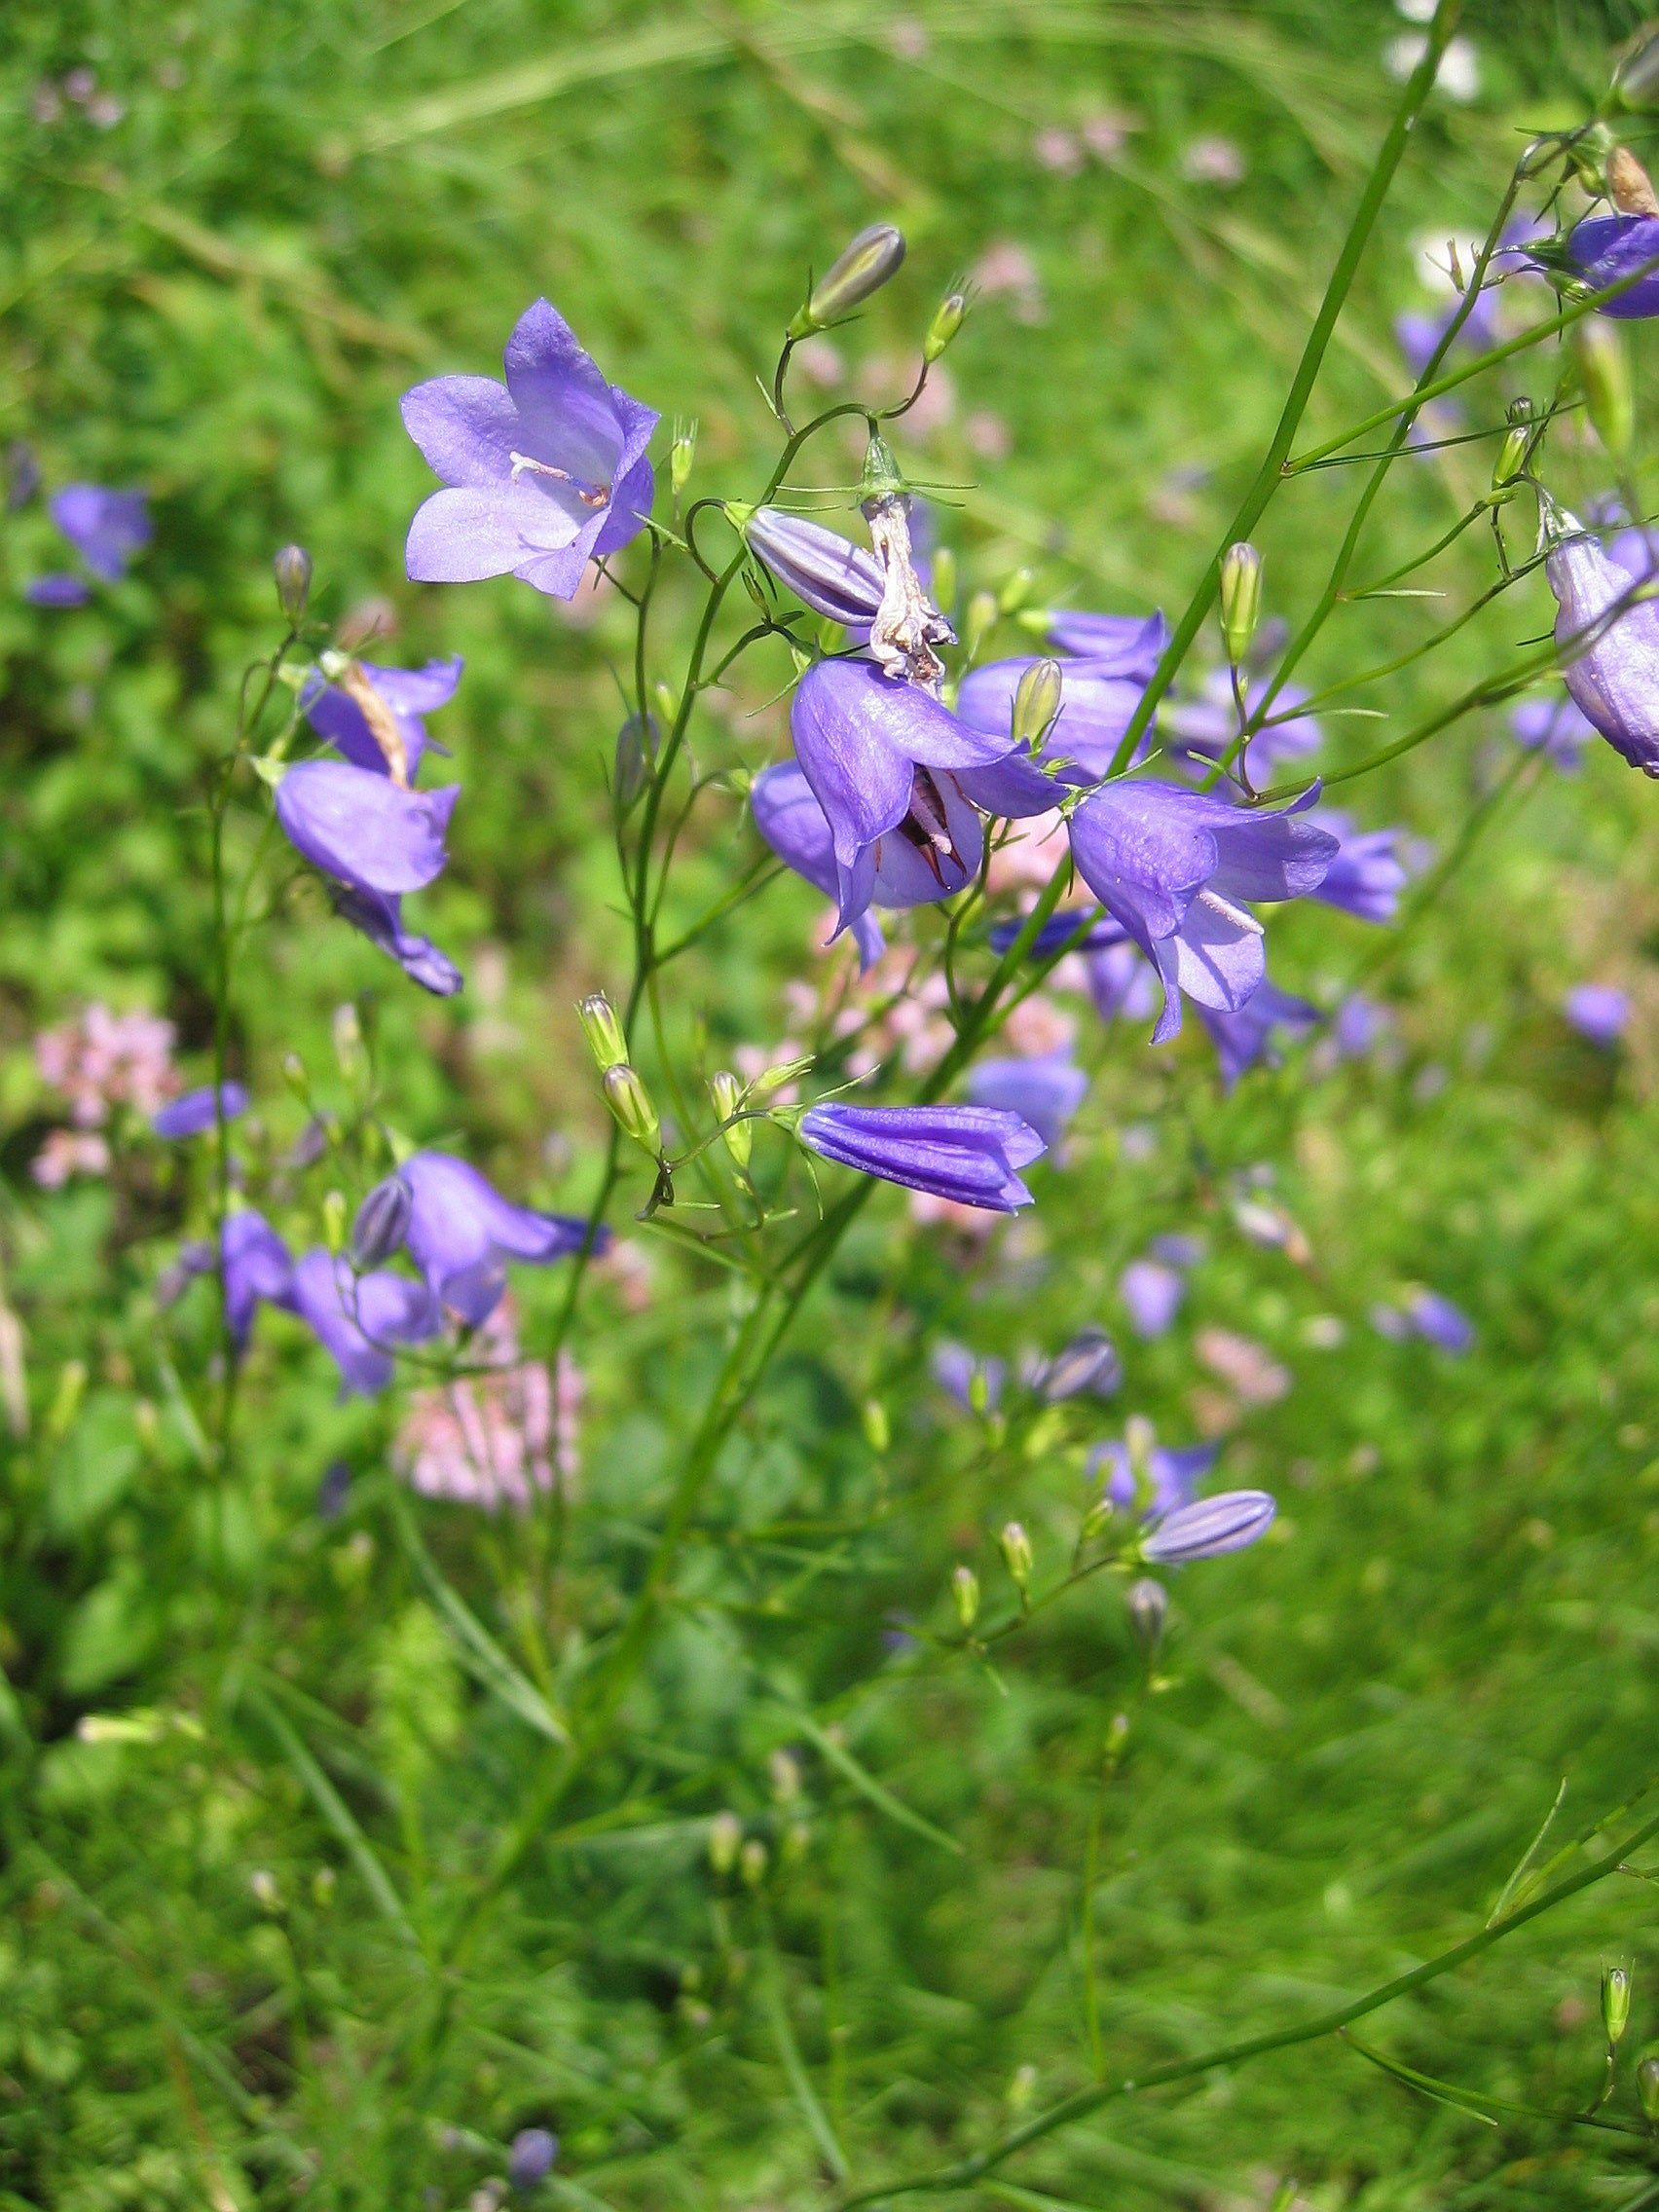 https://i2.wp.com/upload.wikimedia.org/wikipedia/commons/4/4b/Campanula_rotondifolia.jpg